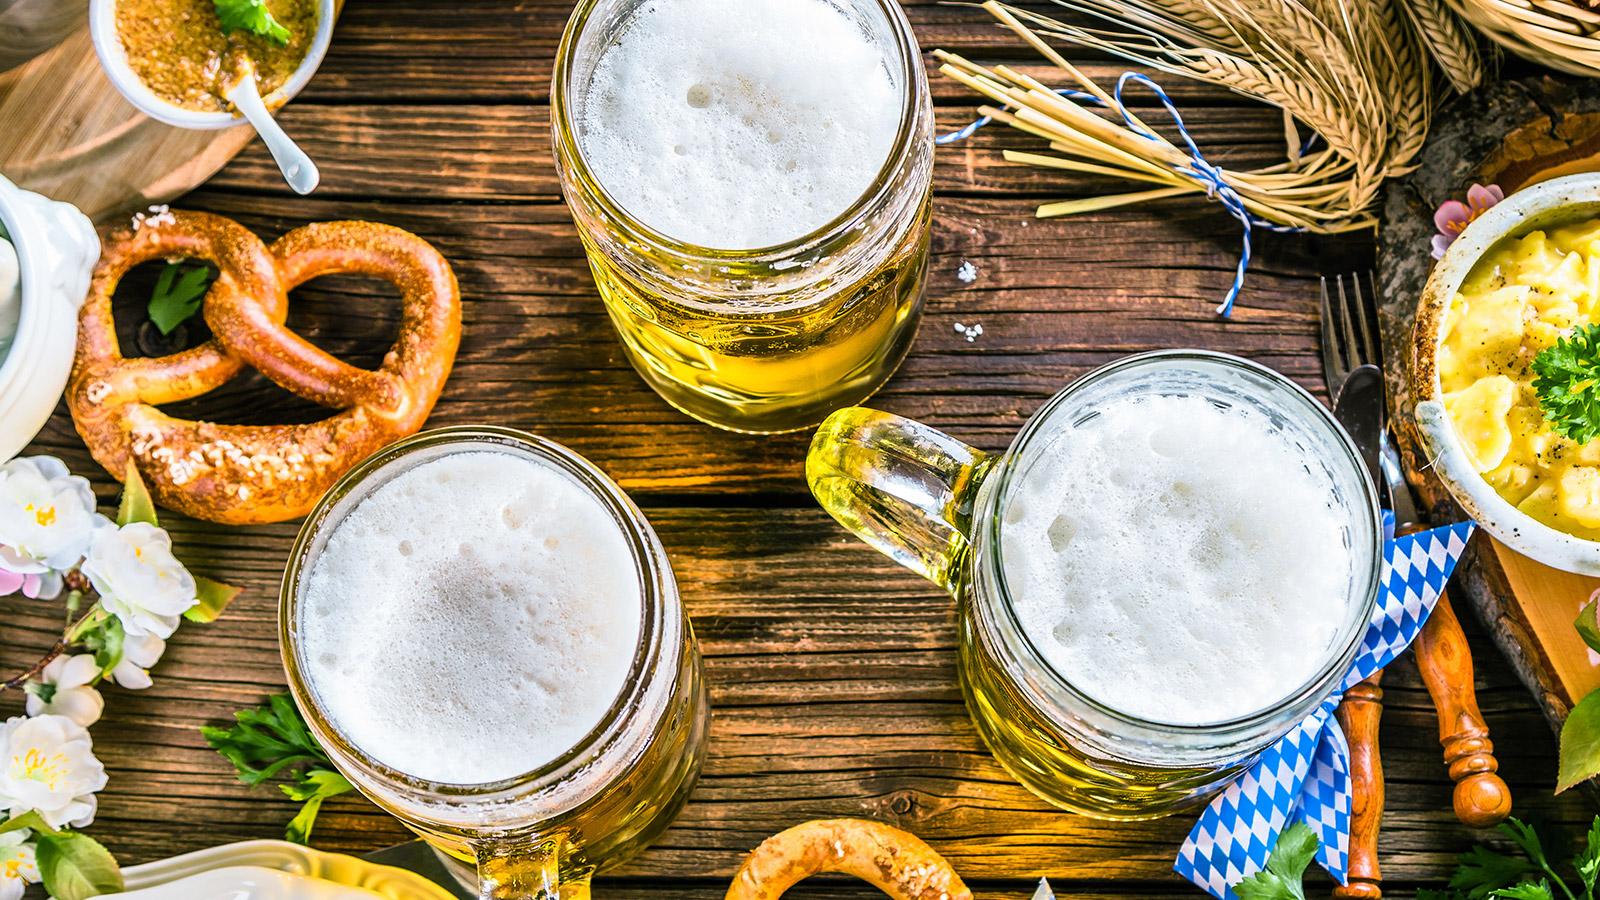 Oktoberfest Beer and Pretzels